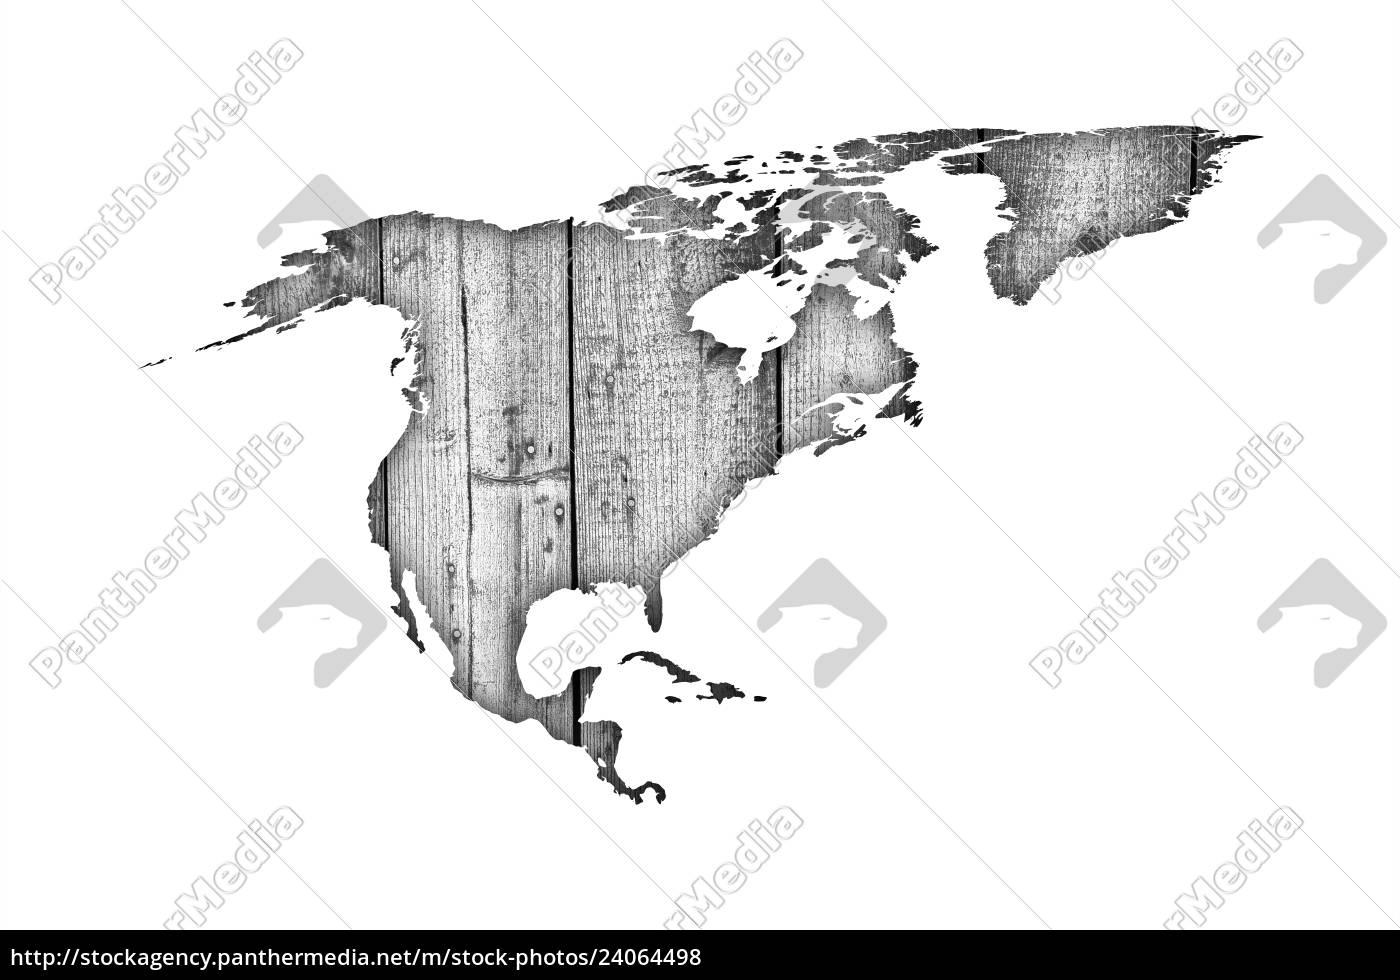 Kort Over Nordamerika Pa Forvitret Trae Stockphoto 24064498